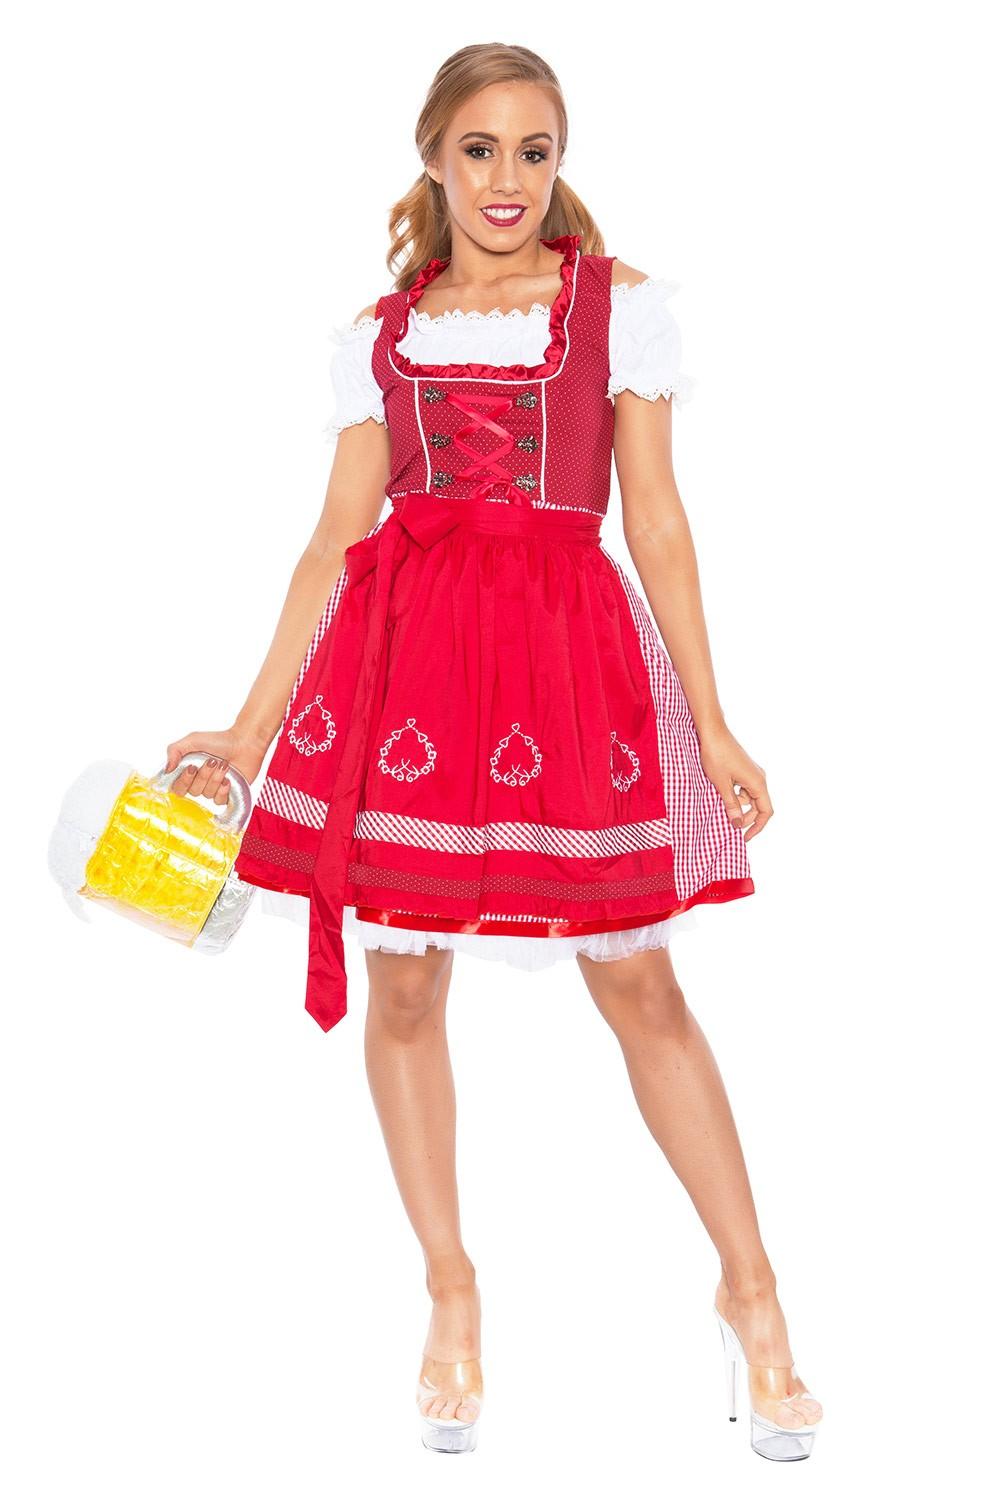 Red Oktoberfest Costume Beer Girl Wench Fancy Dress German Heidi Bavarian Outfit